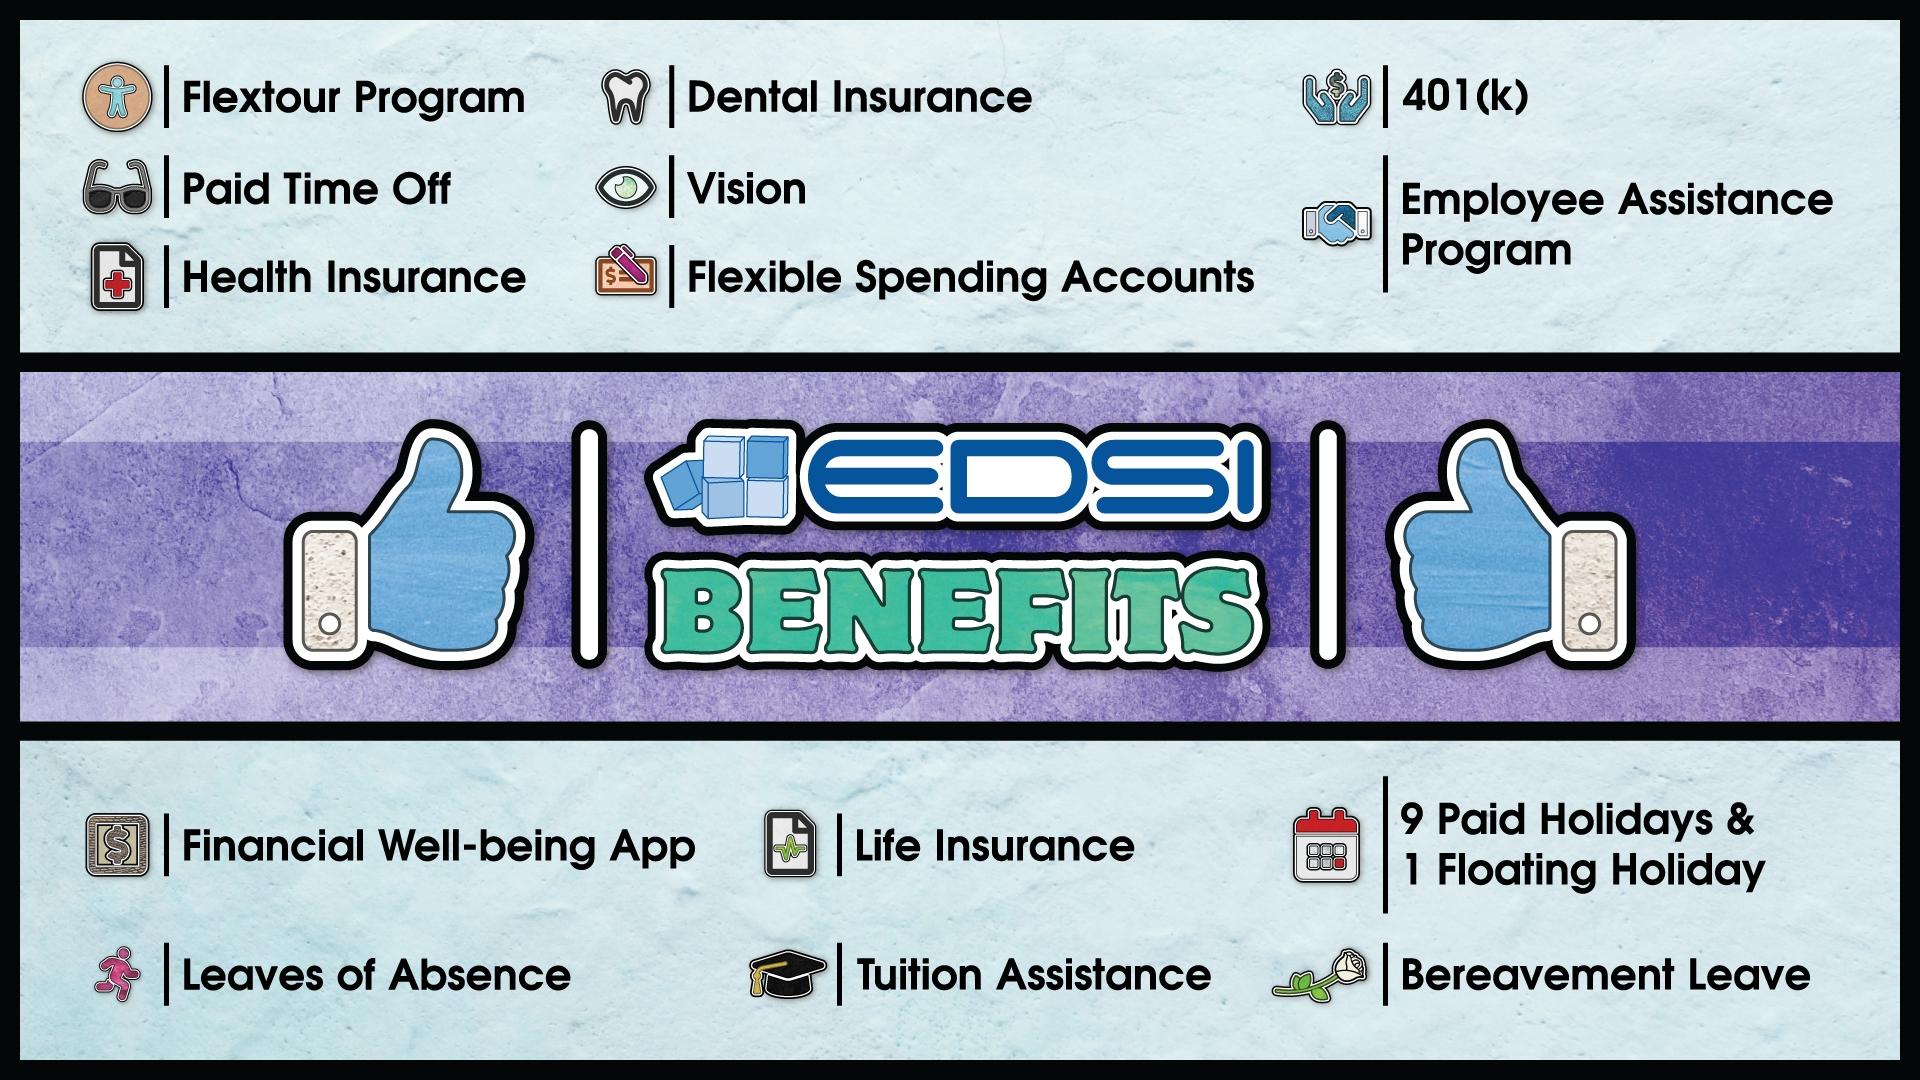 EDSI Benefits